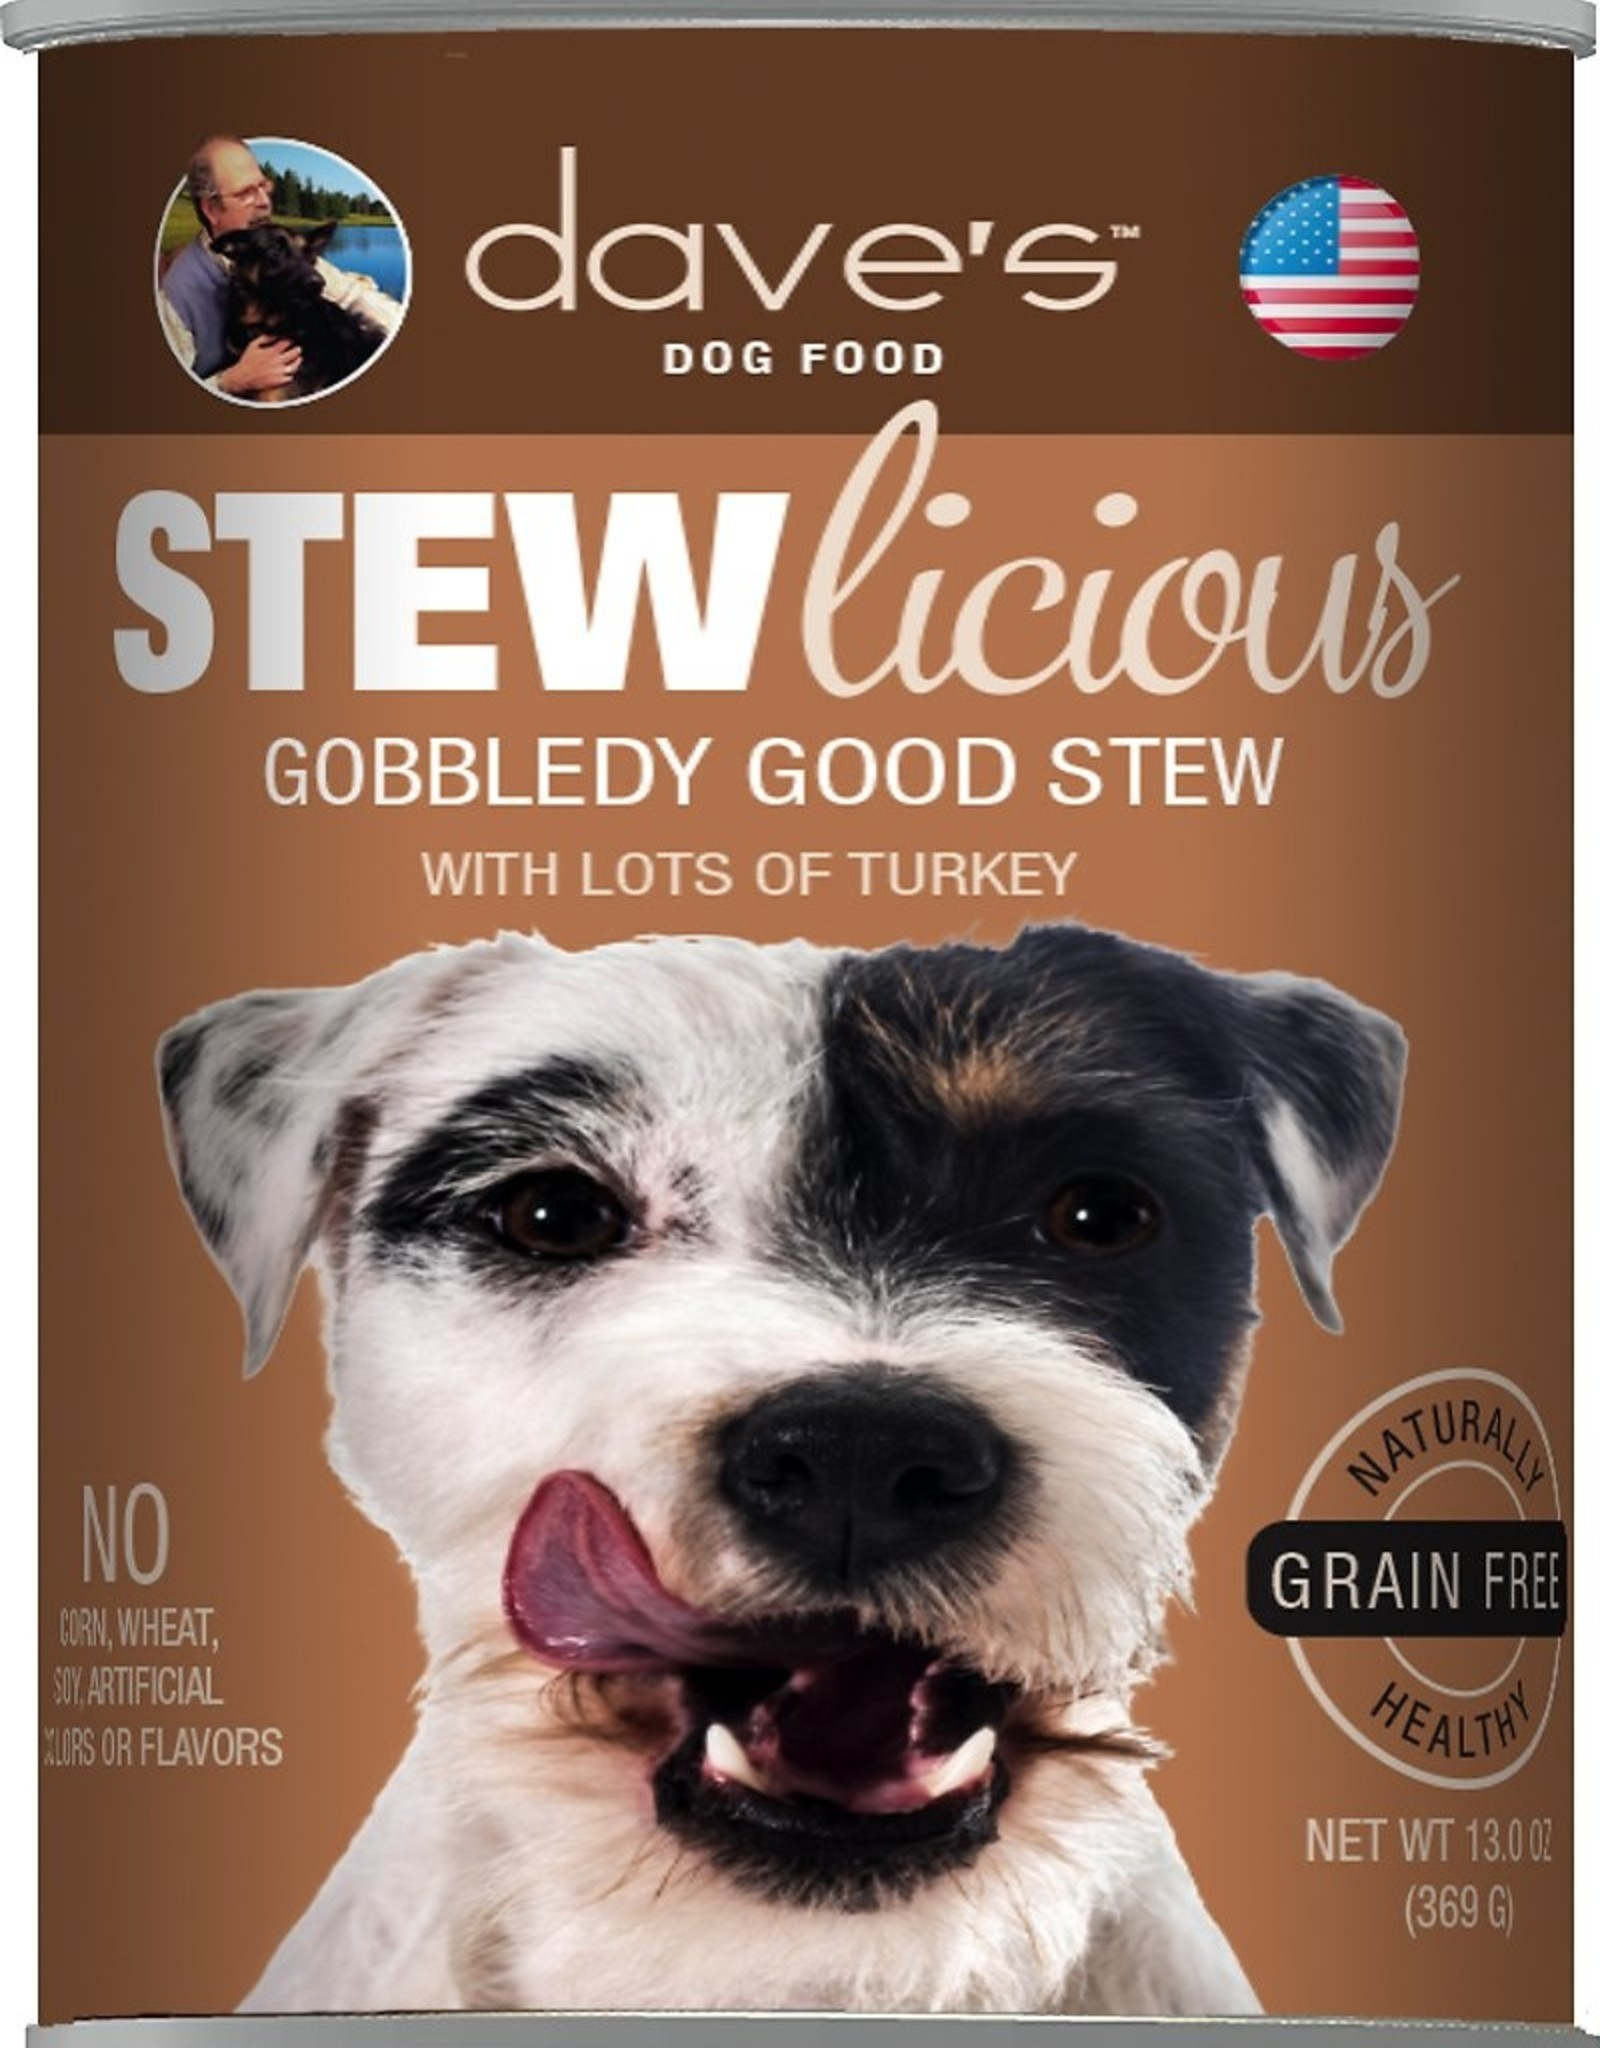 Daves Pet Food Dog Gobbledy Good Stew - Grain-Free 13oz